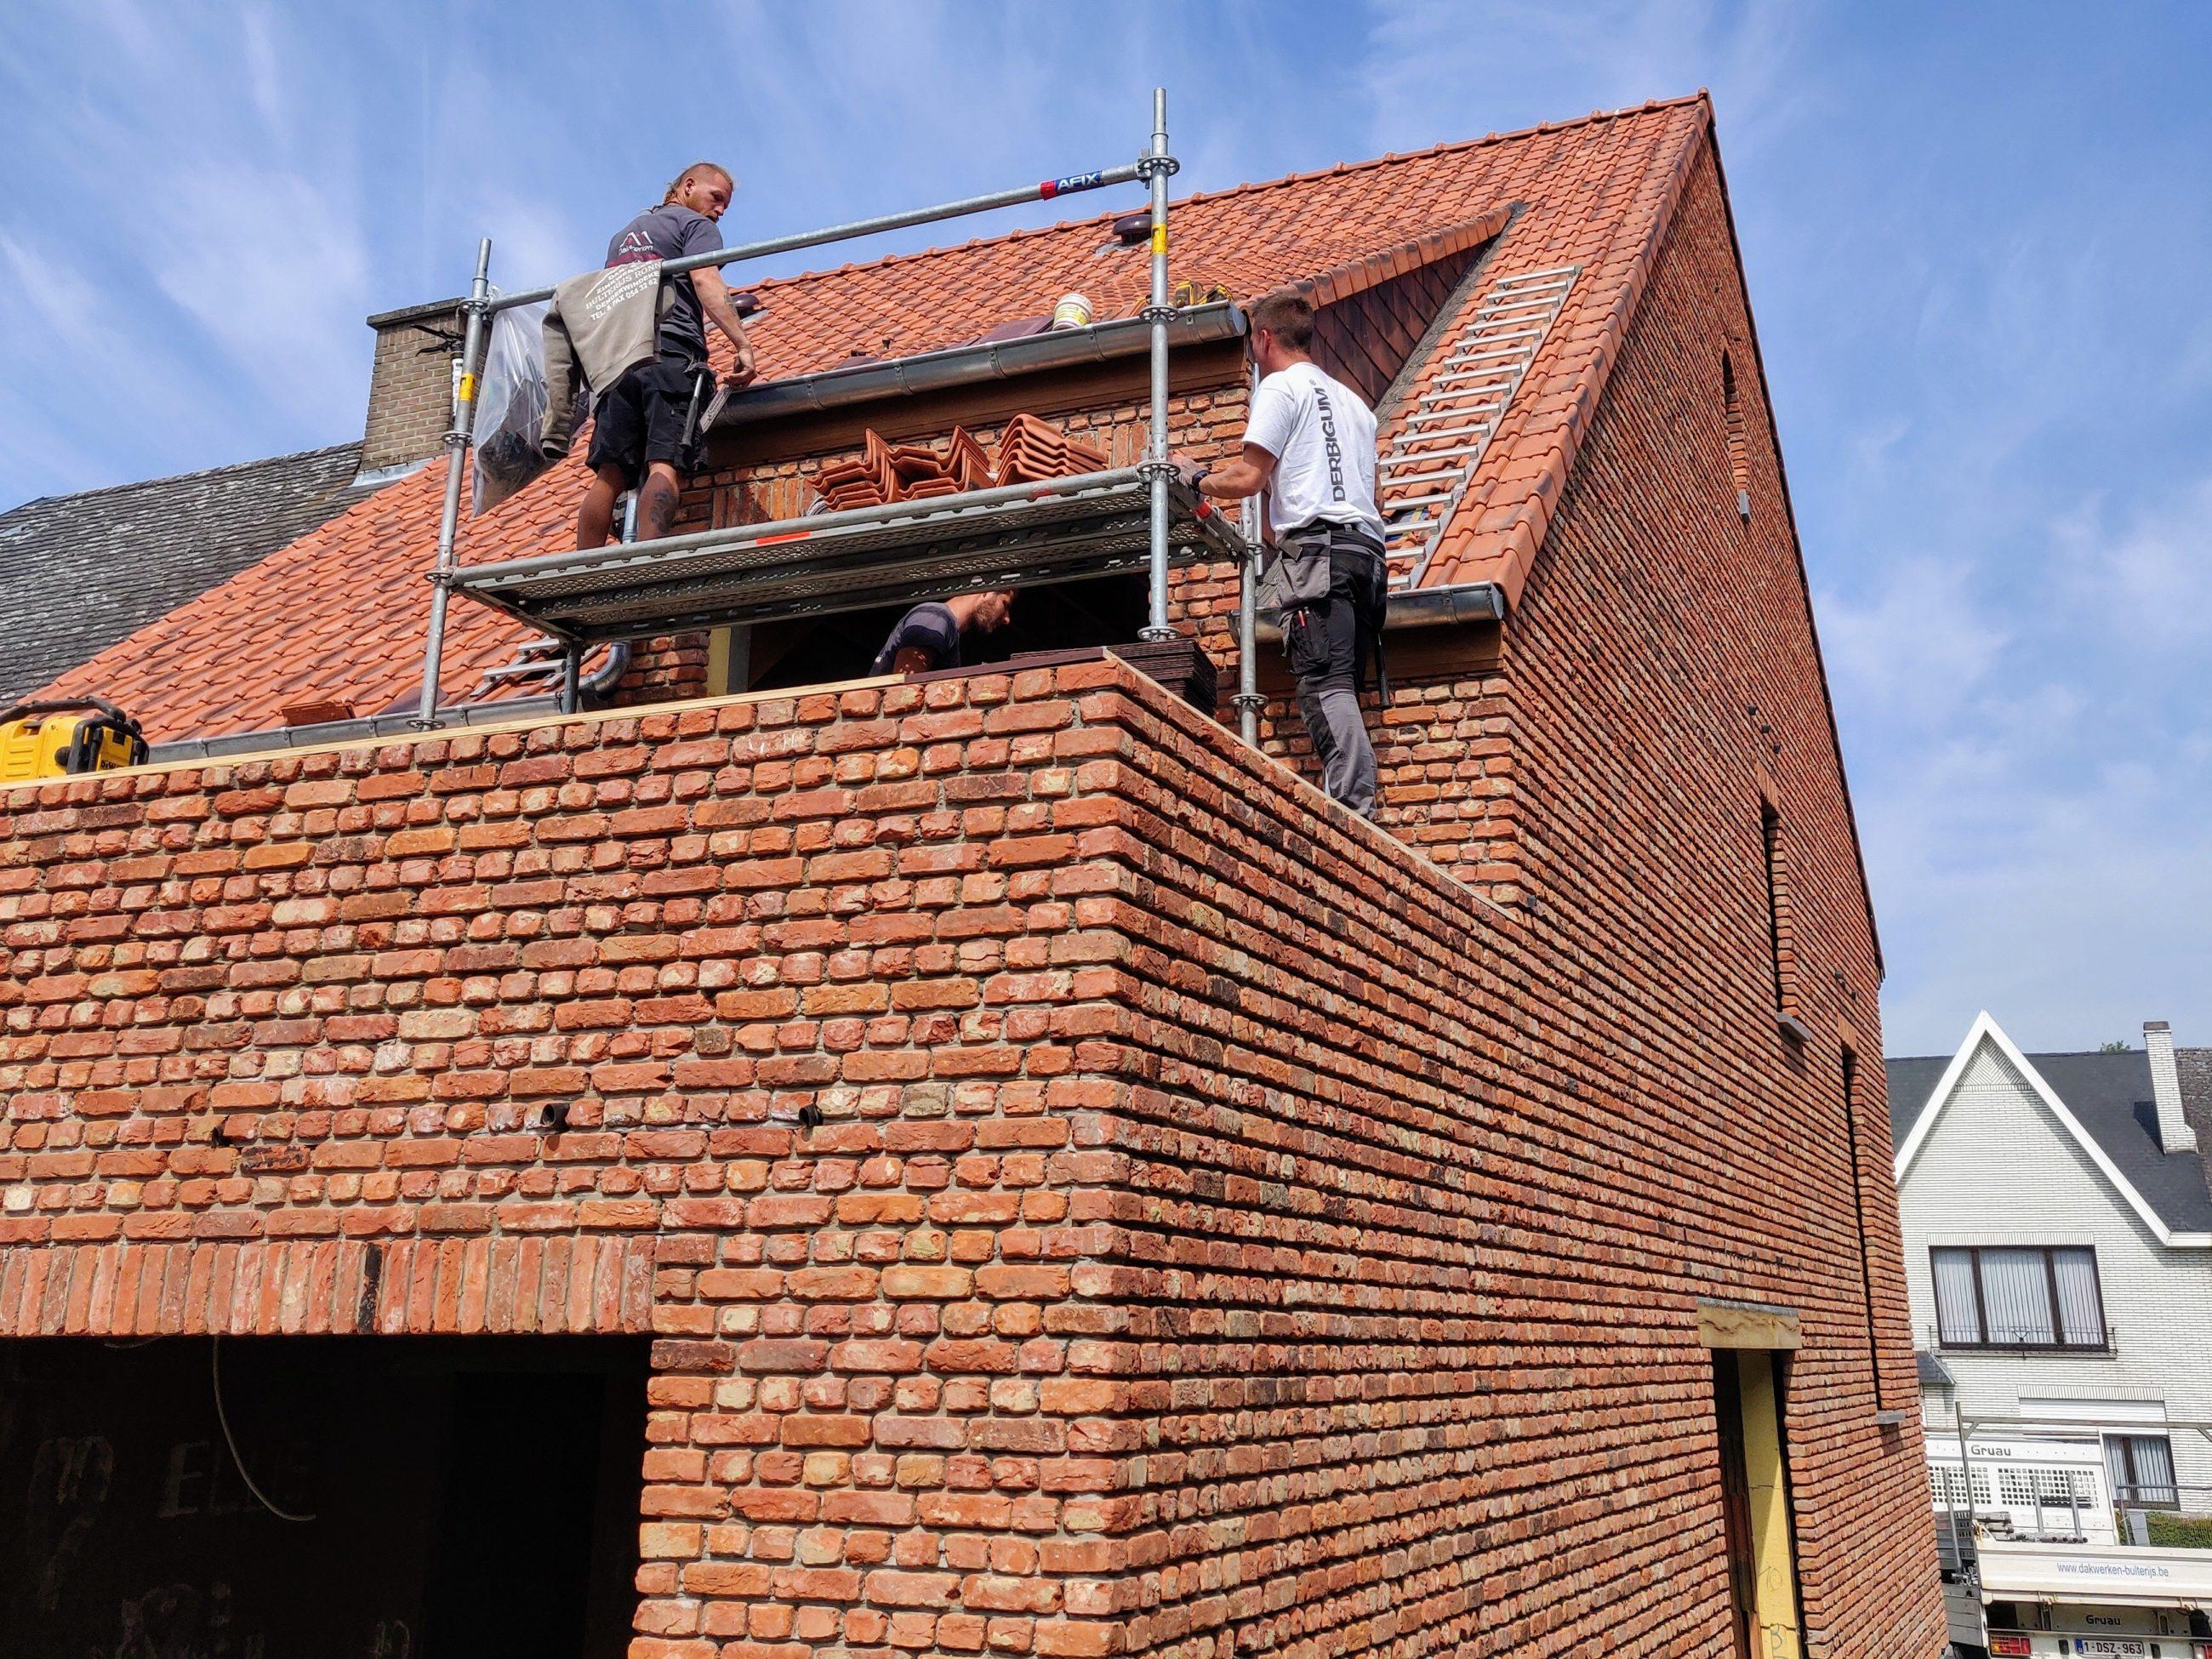 Nieuwbouw Koramic 44 Oud Latem gallery image 5